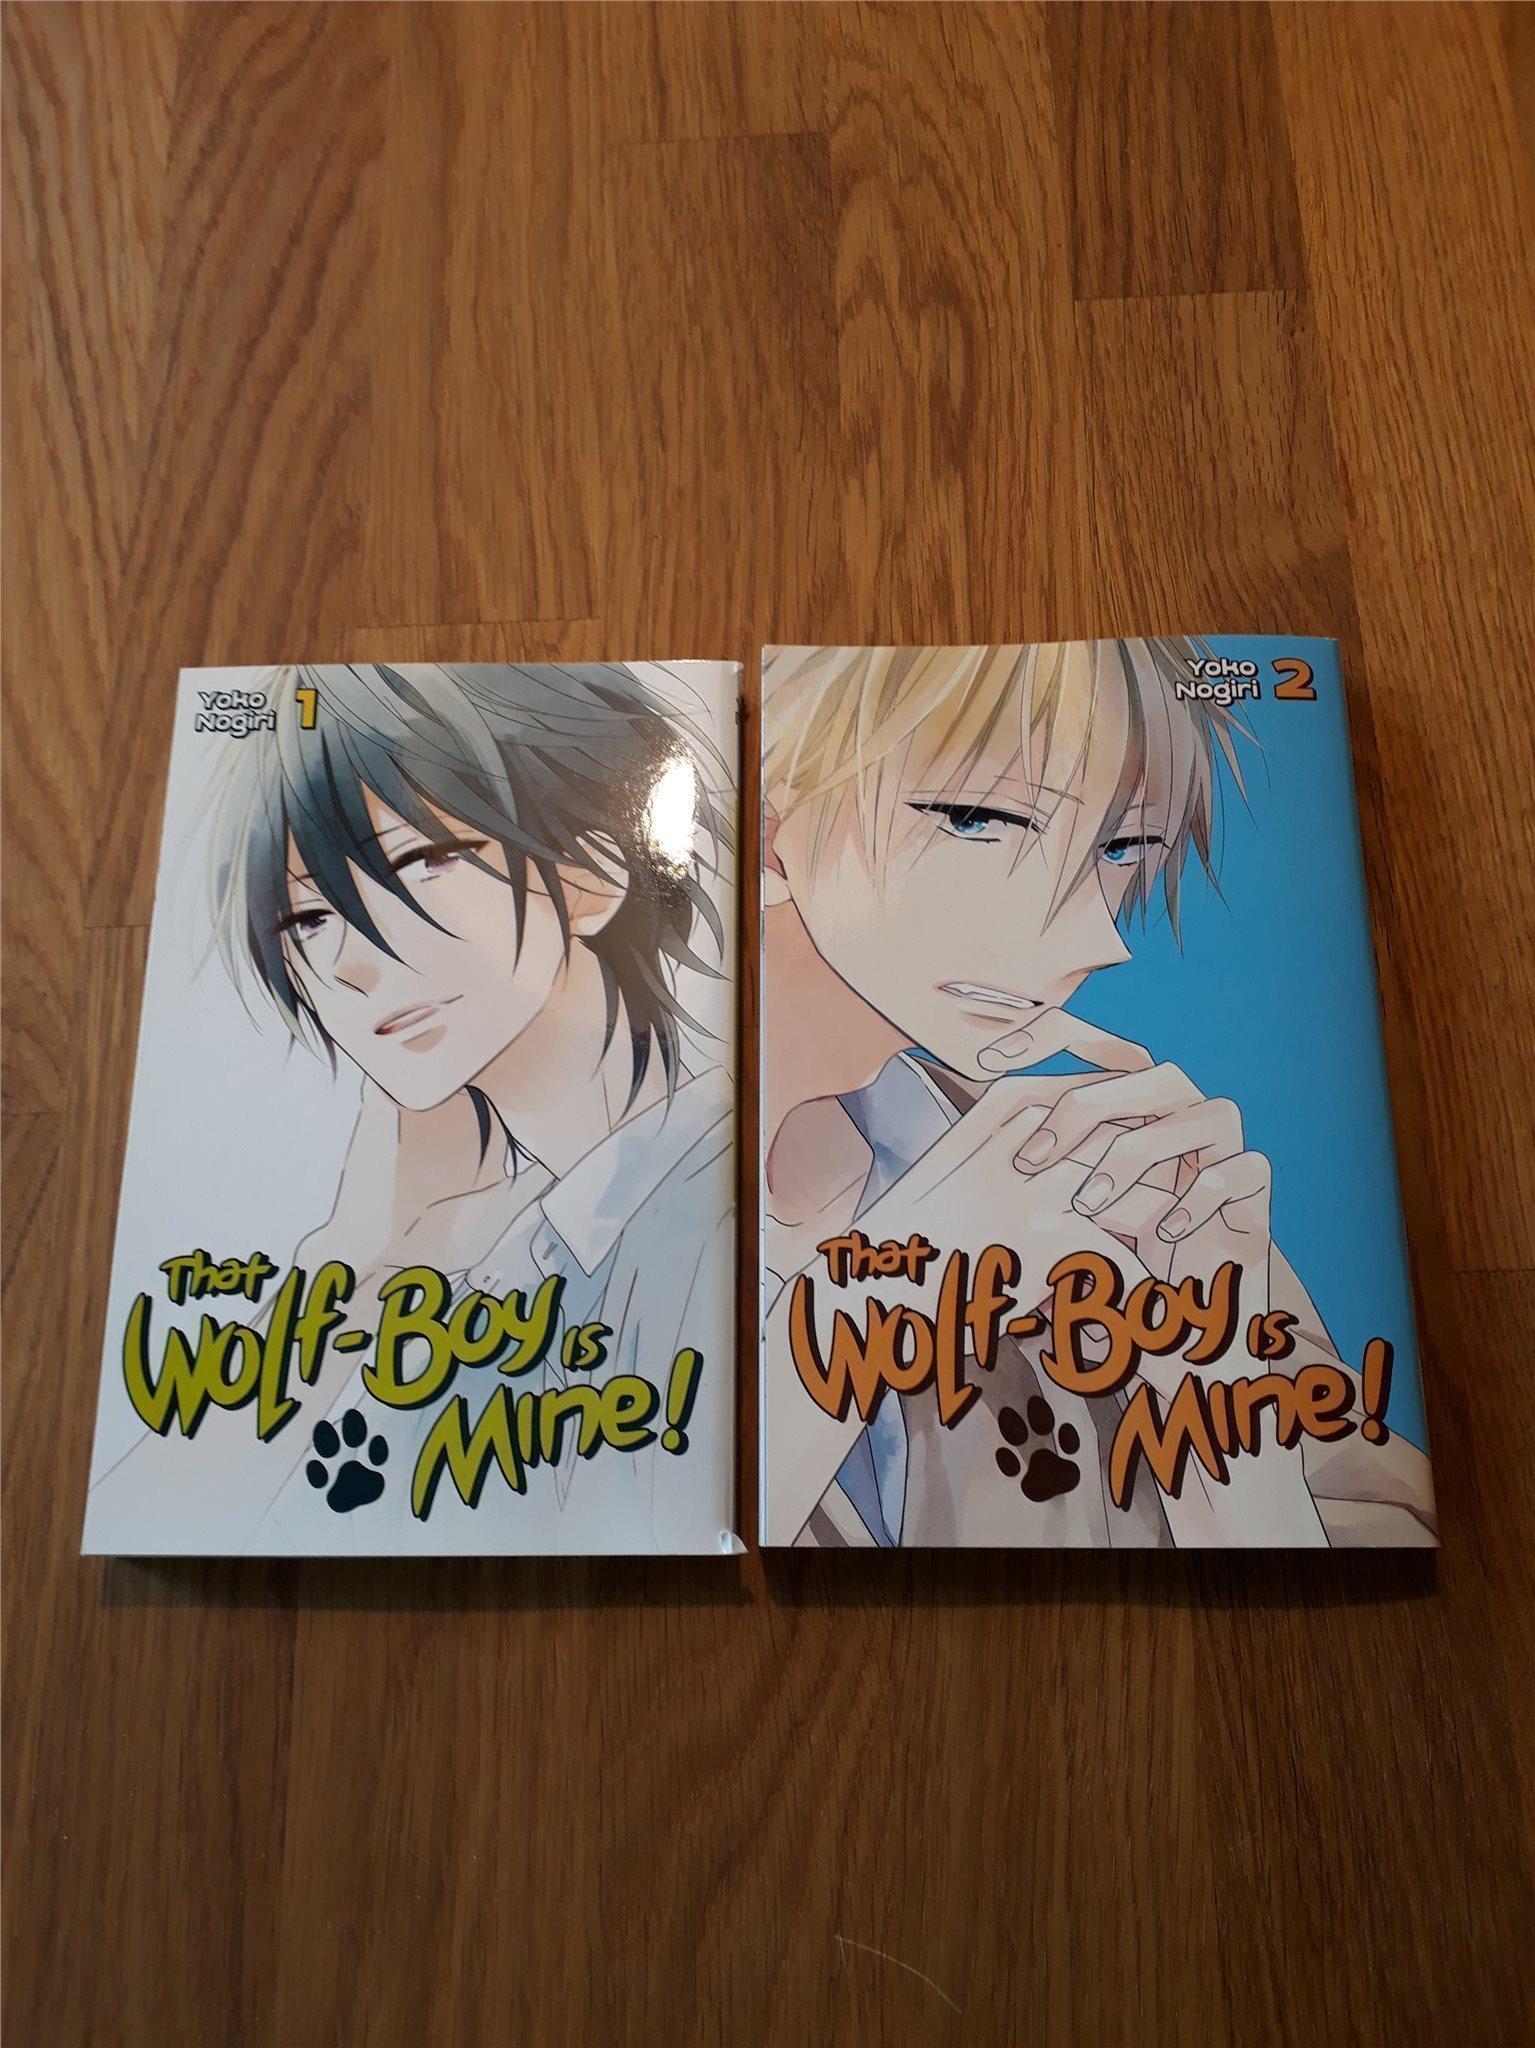 That wolf-boy is mine! vol 1-2 av Yoko Nogiri (Manga